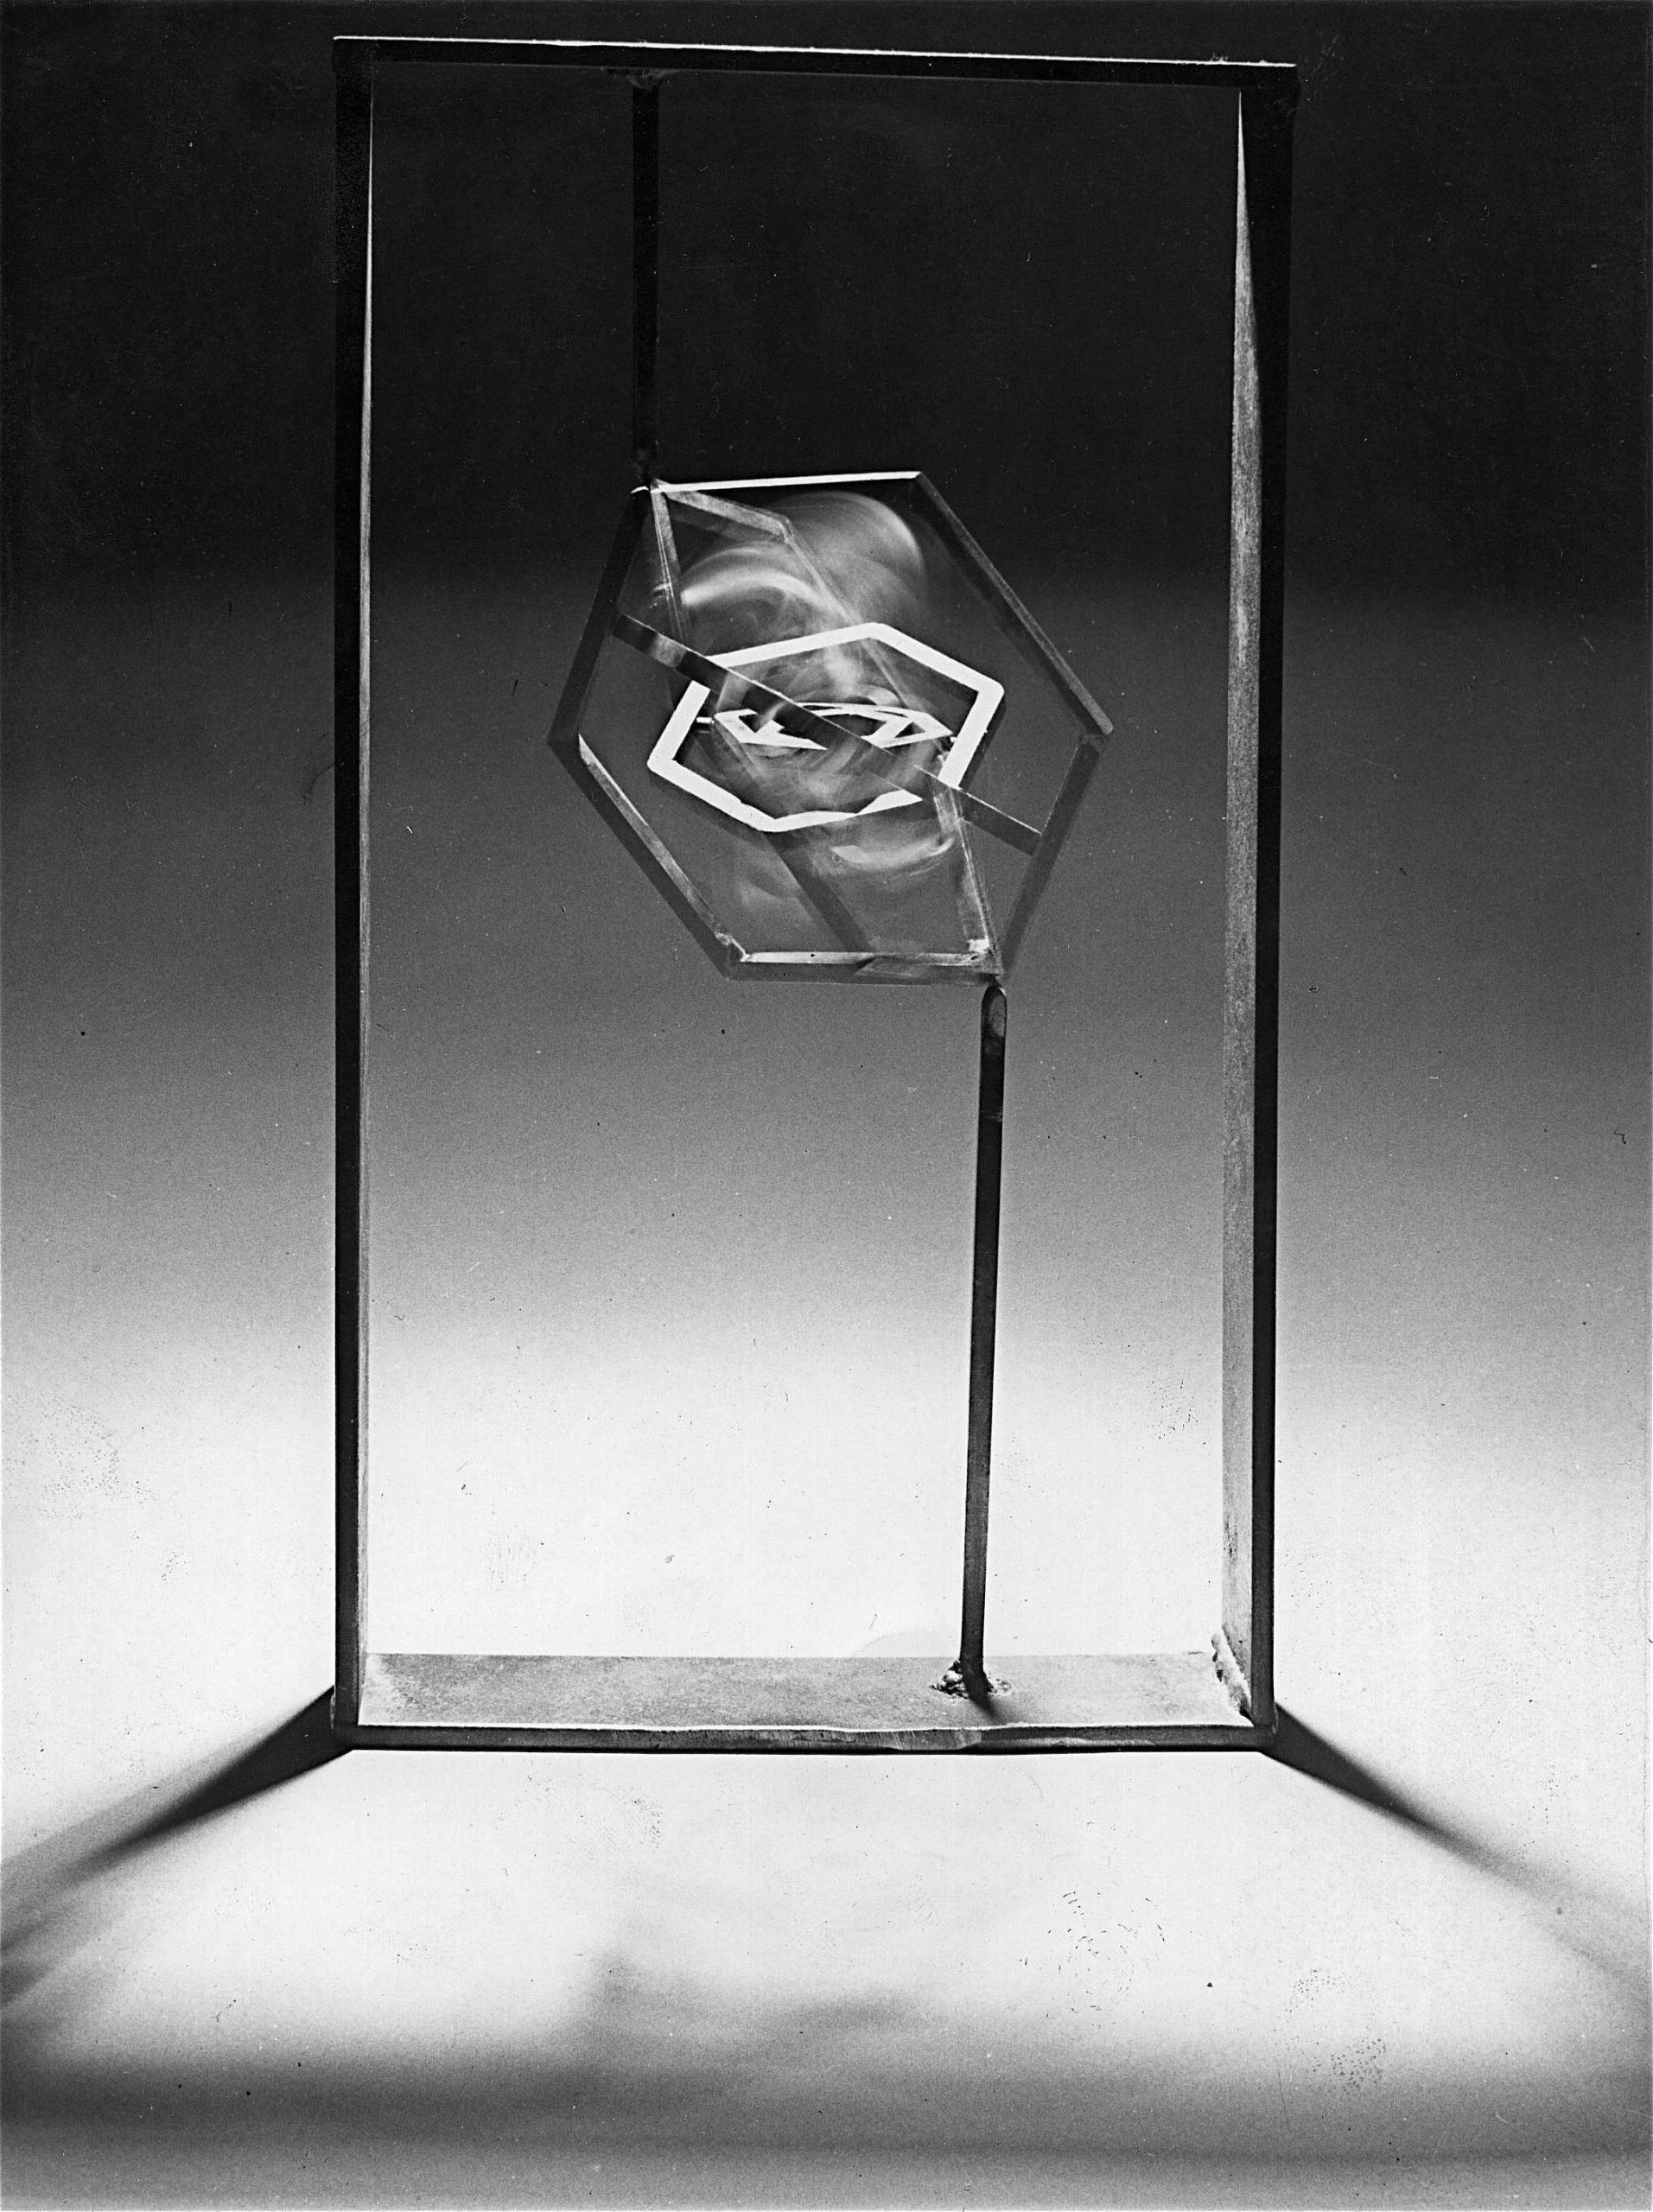 Mobile-des-hexagons